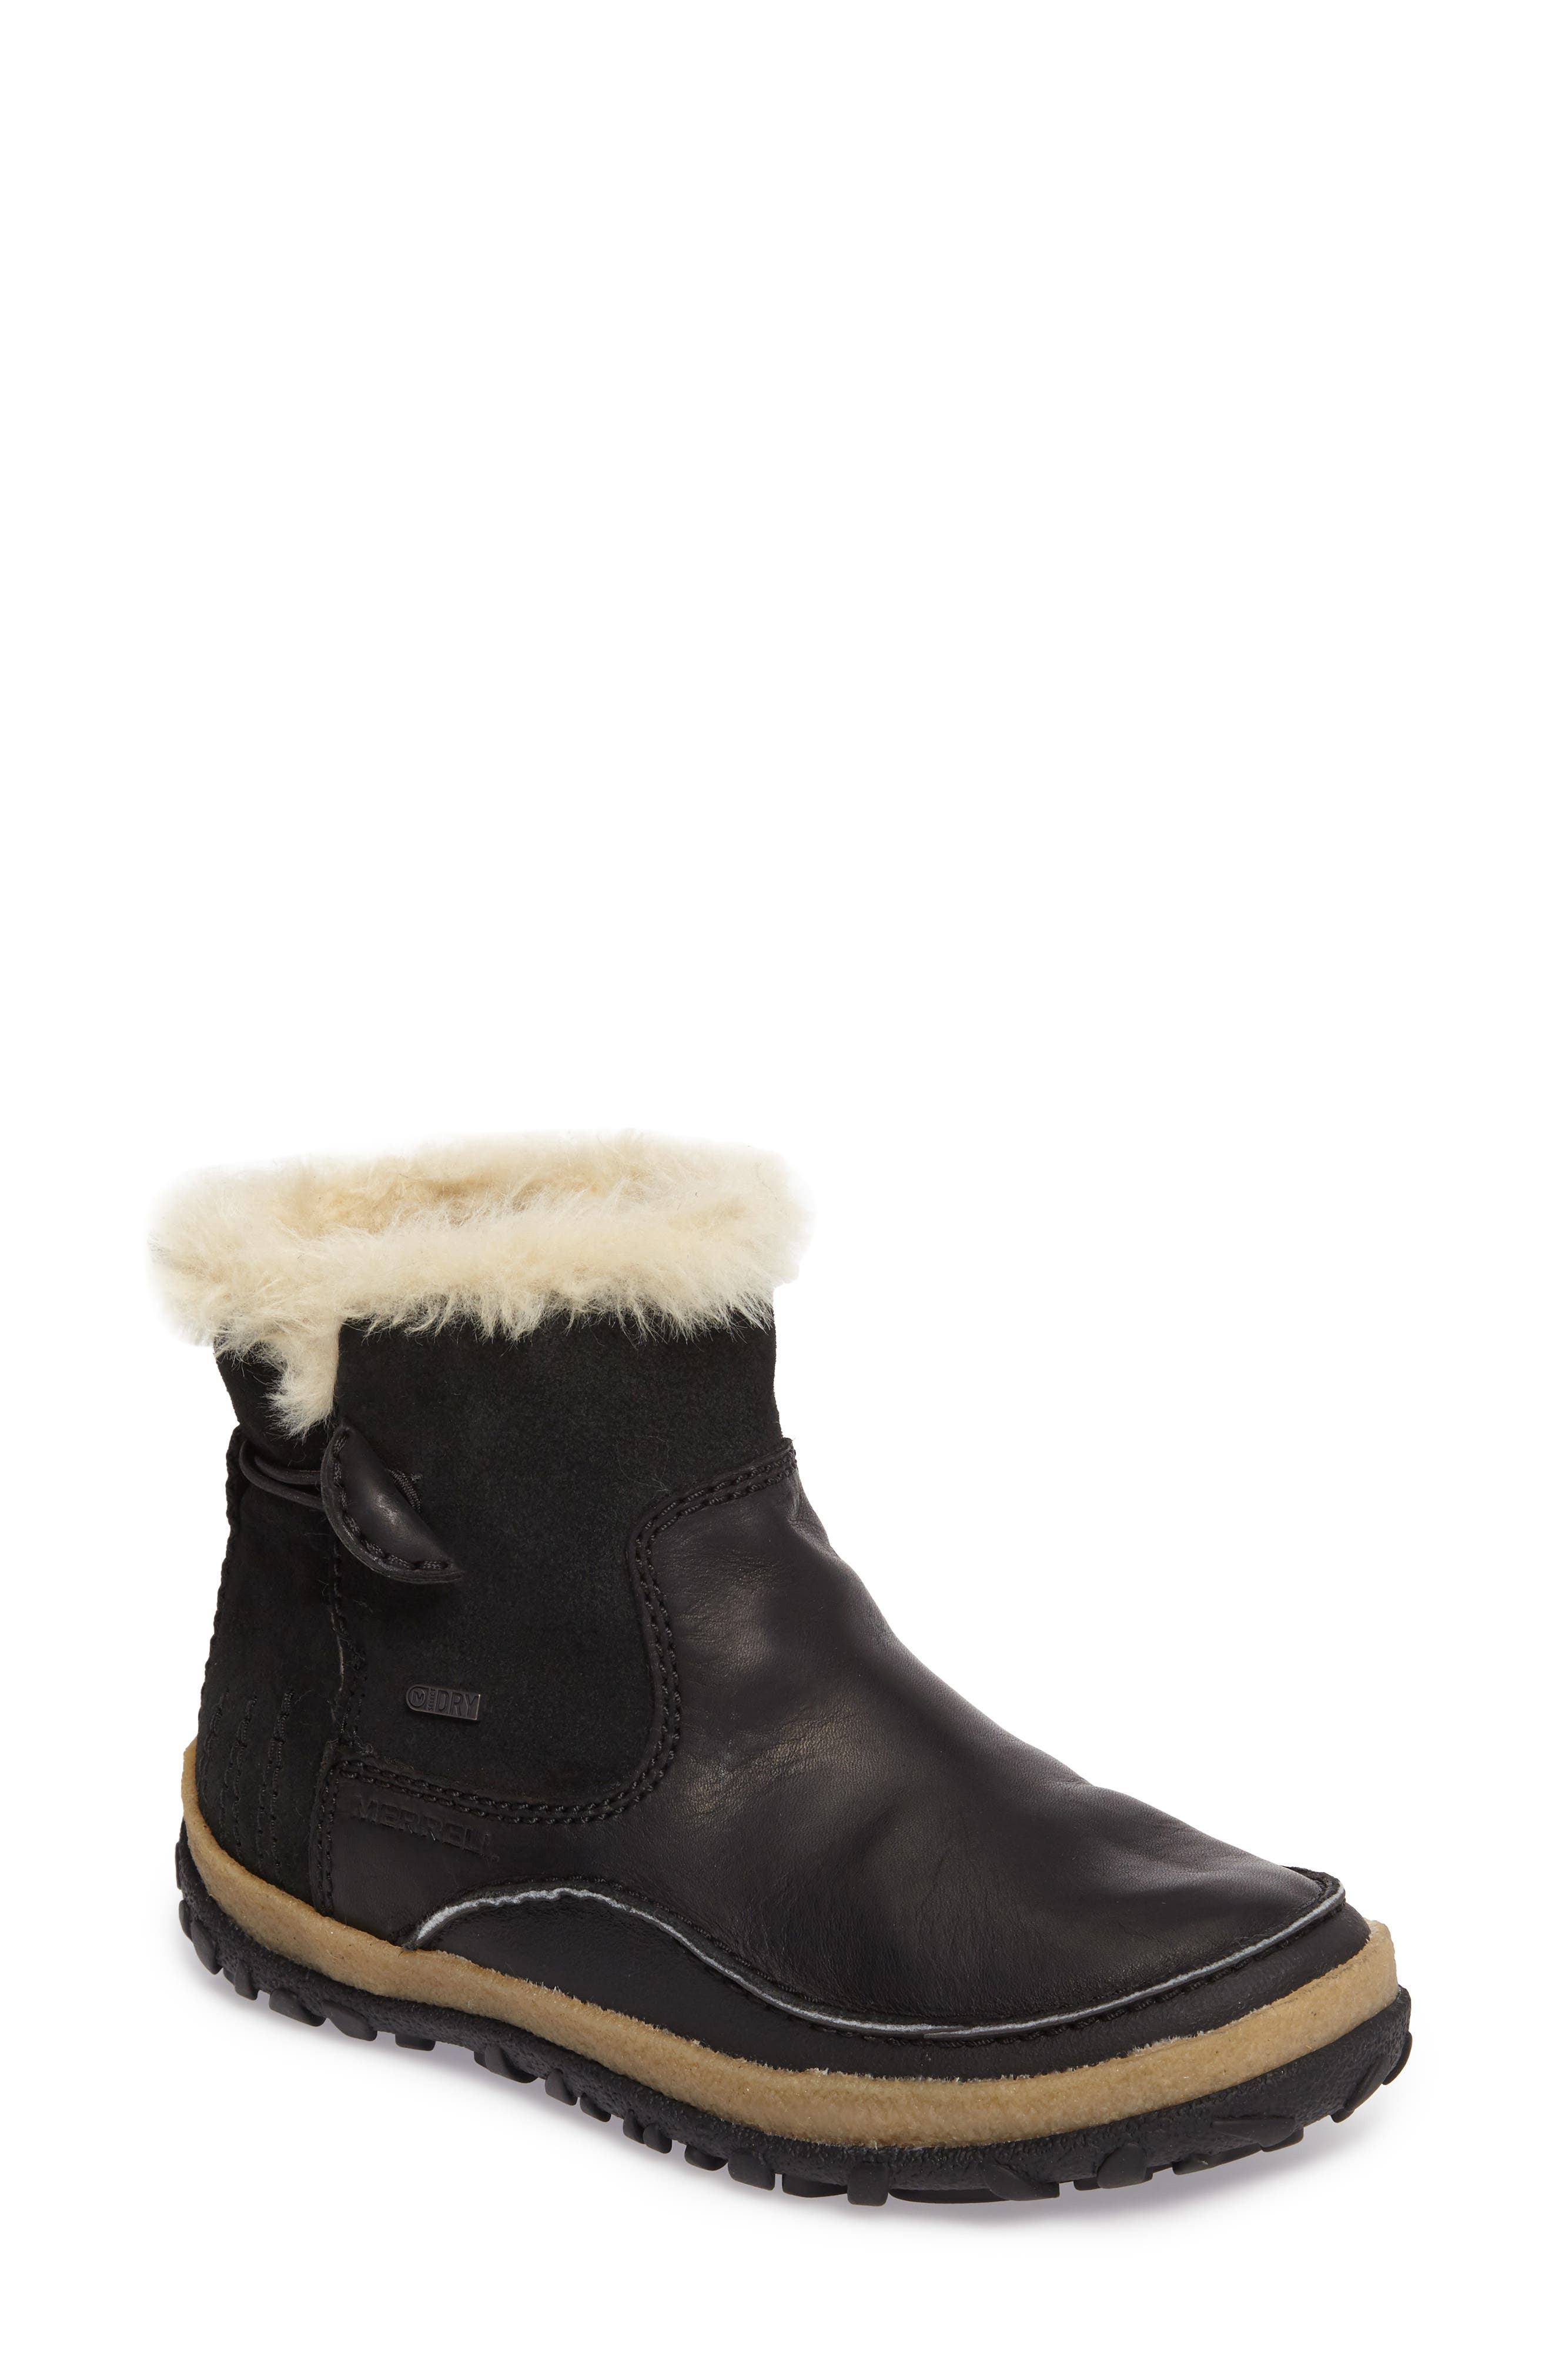 Merrell Tremblant Pull-On Polar Waterproof Bootie (Women)